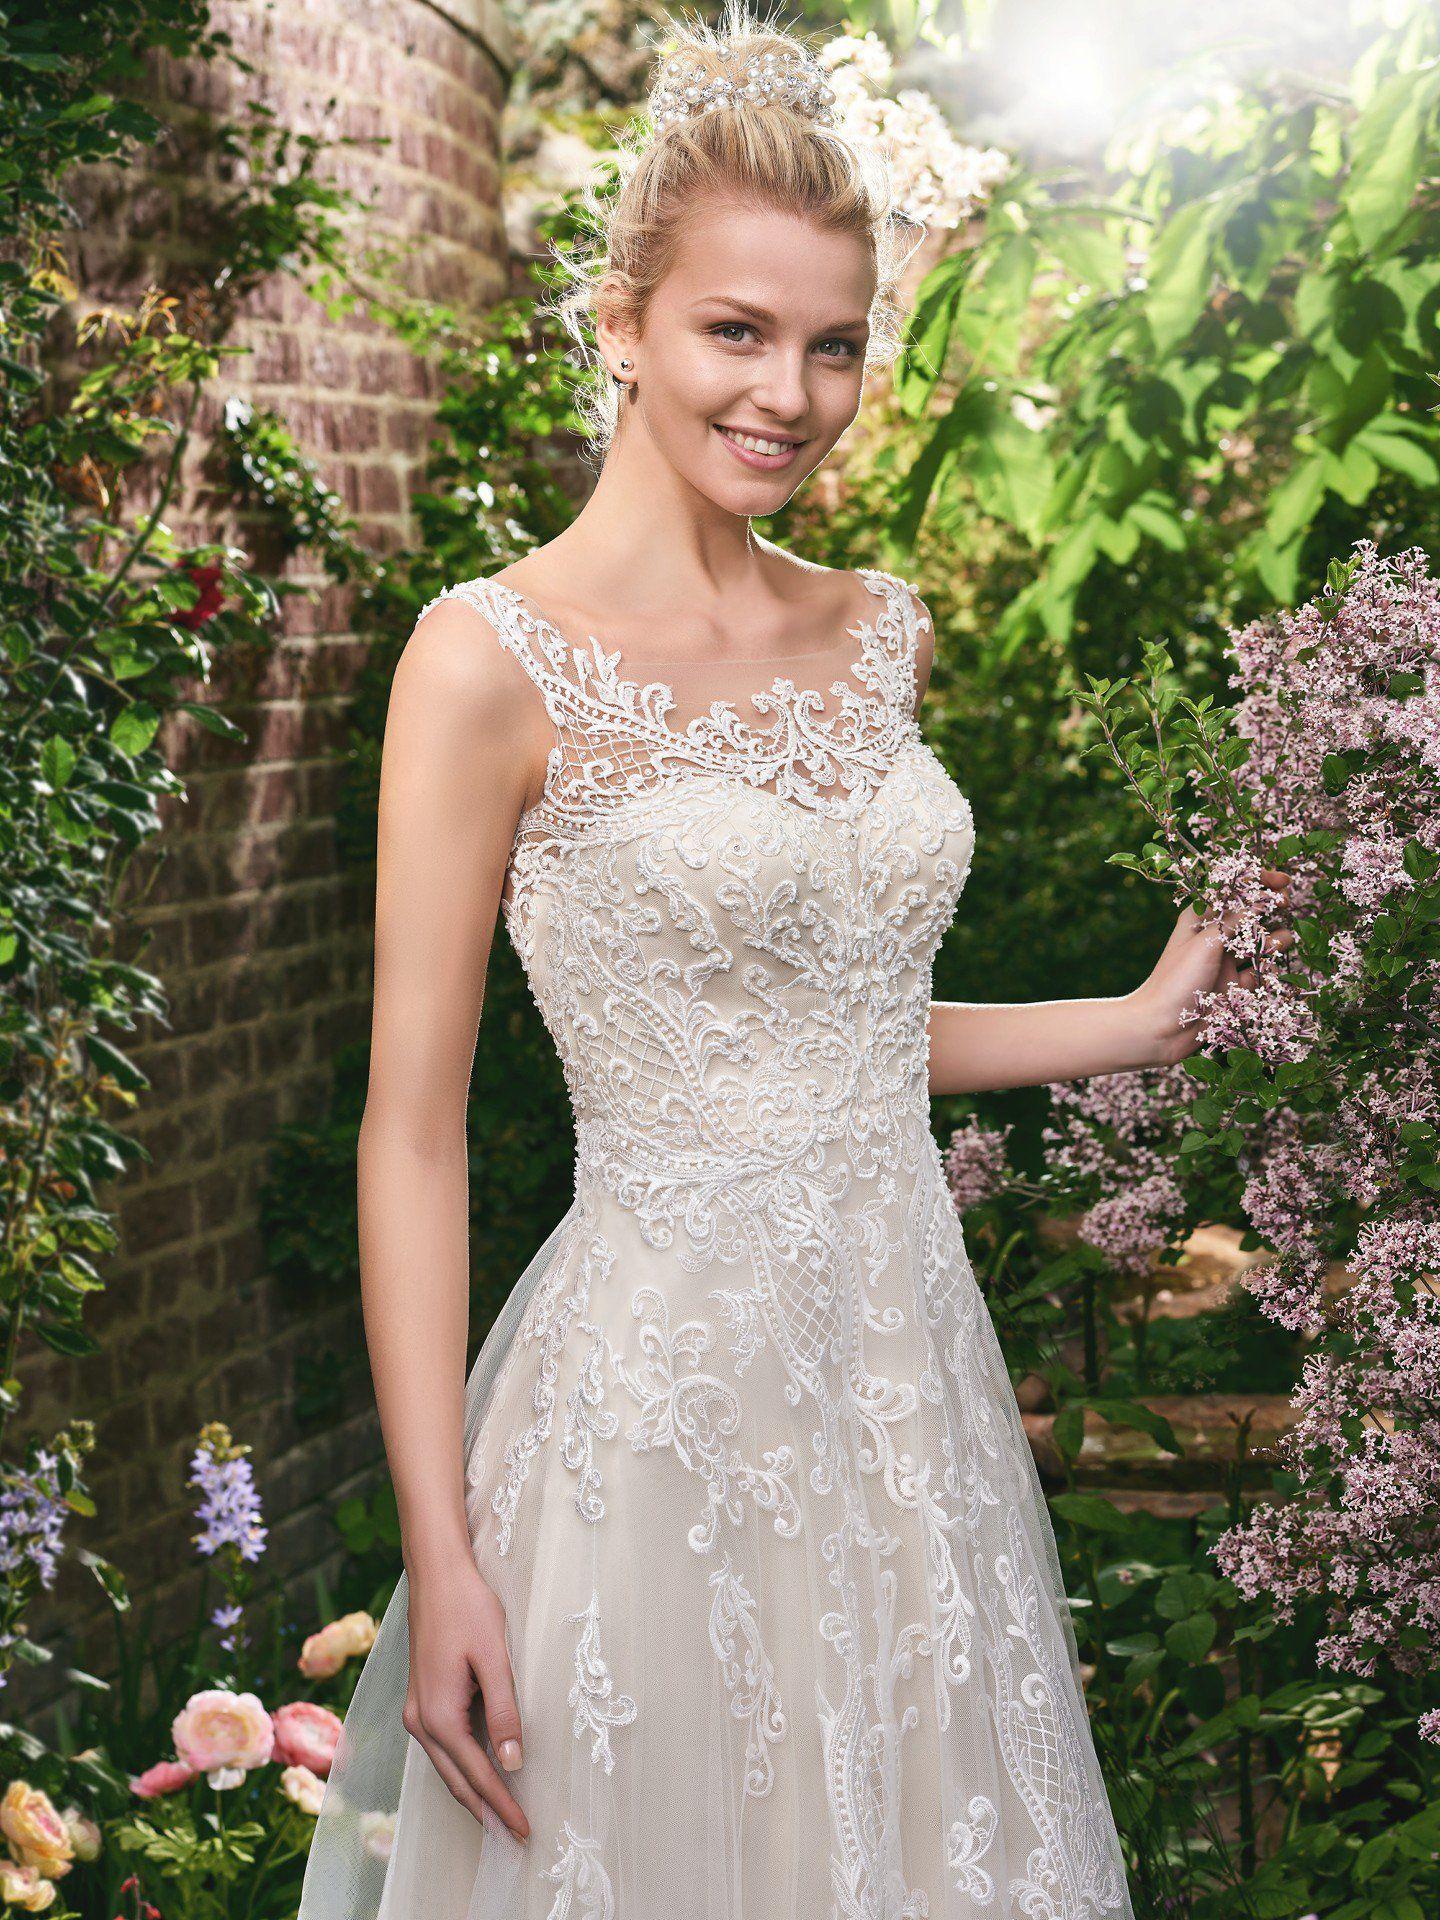 alexis rose wedding dress designer